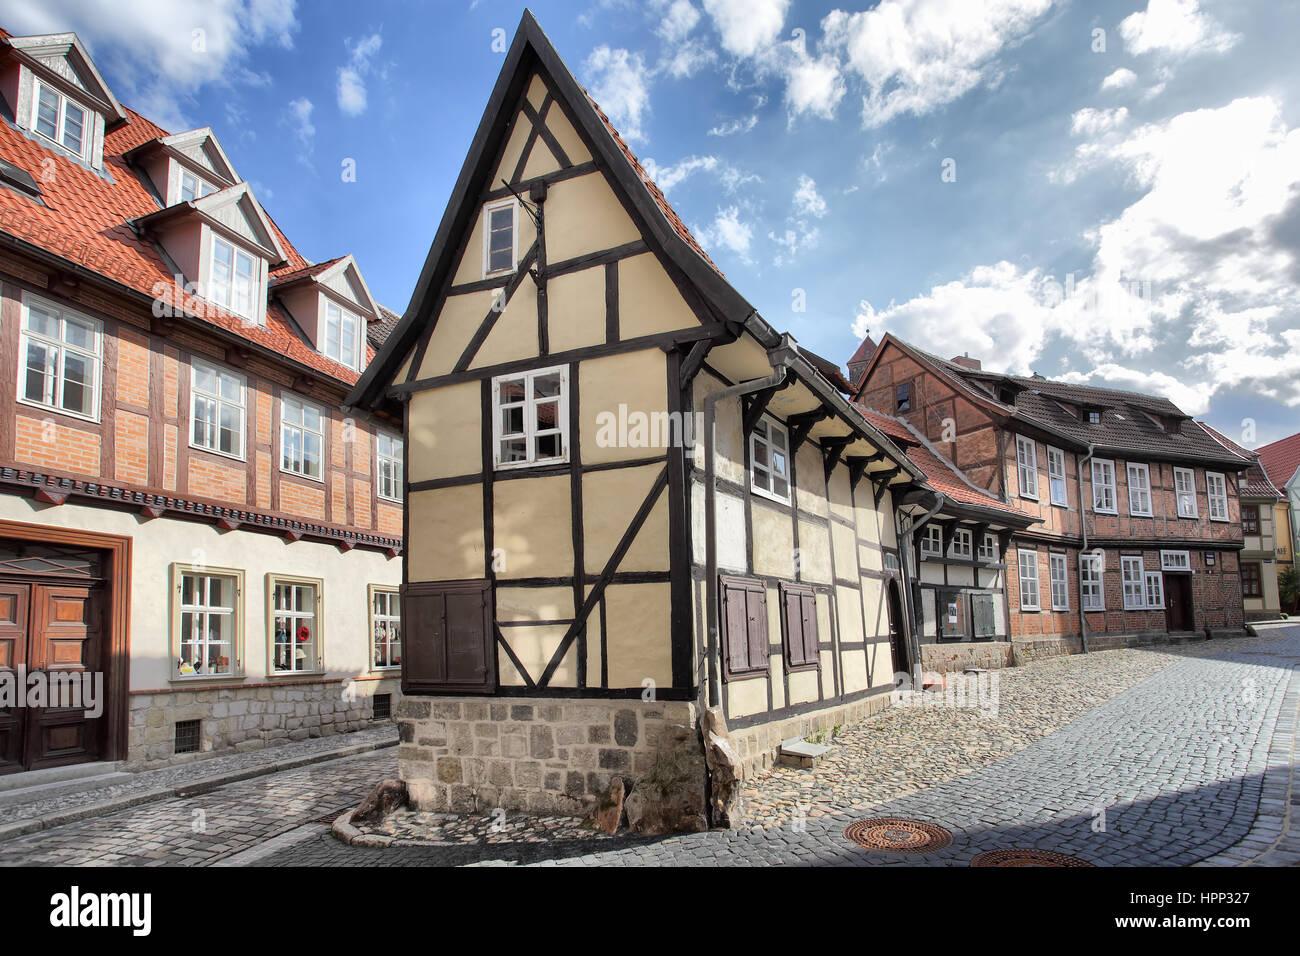 Timber Framing Houses Stockfotos & Timber Framing Houses Bilder - Alamy